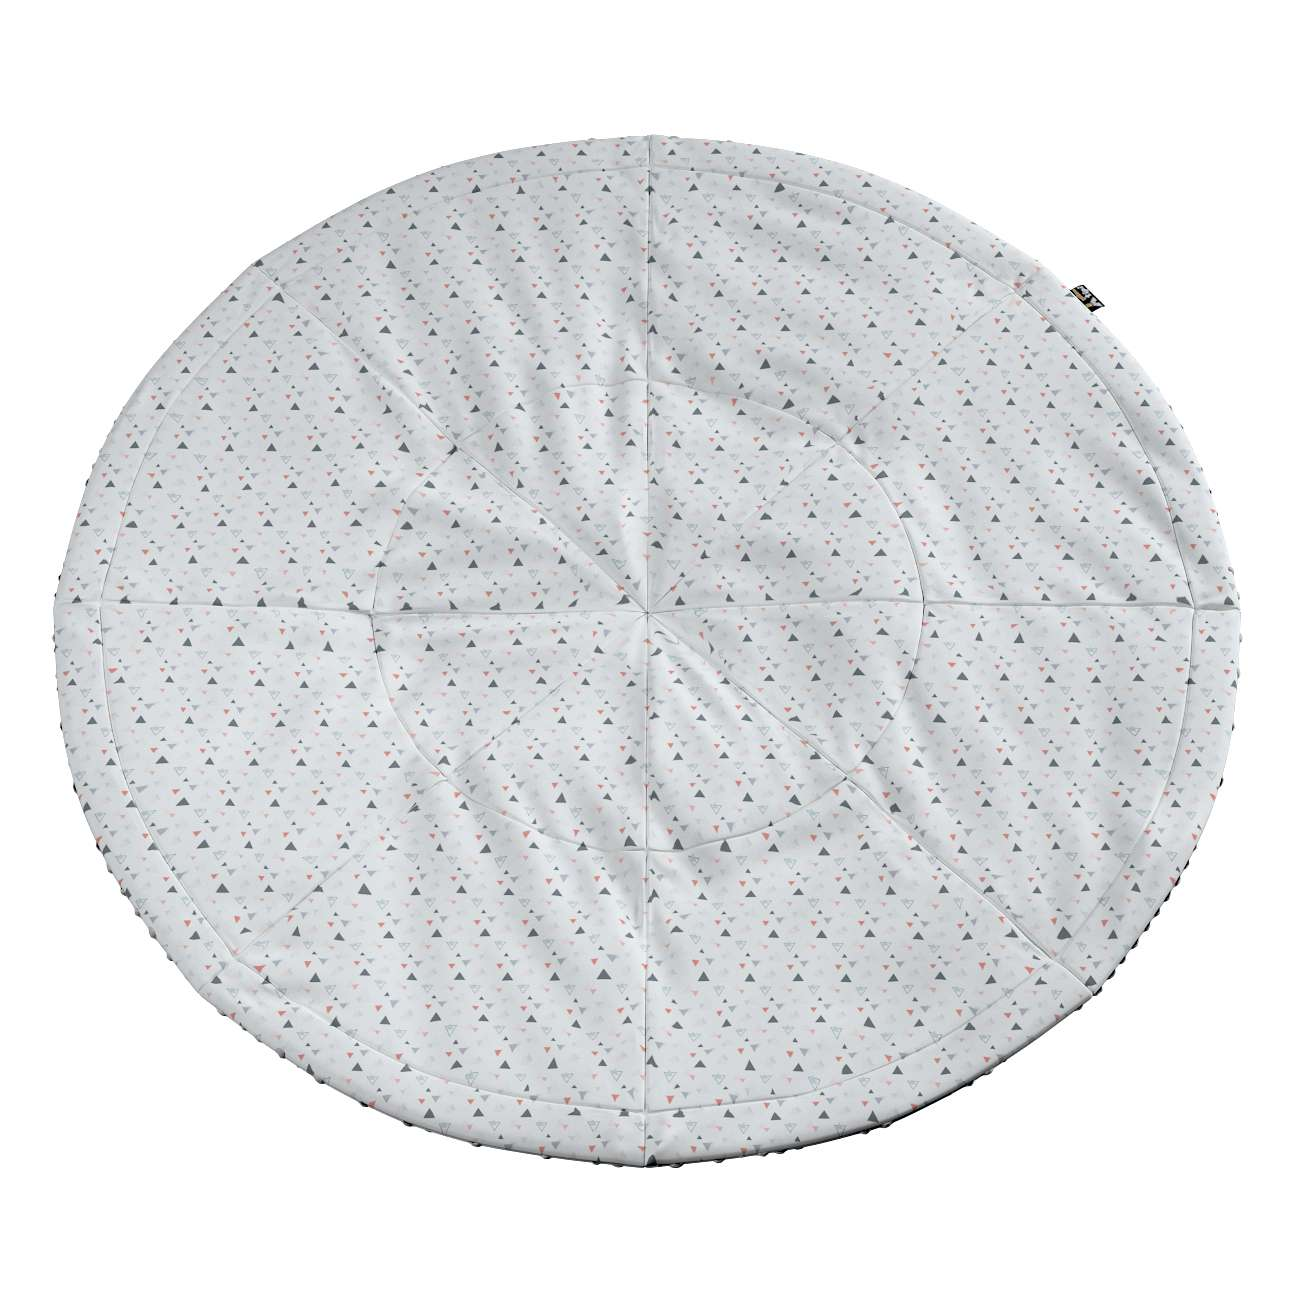 Apvalus kilimėlis kolekcijoje Magic Collection, audinys: 500-22